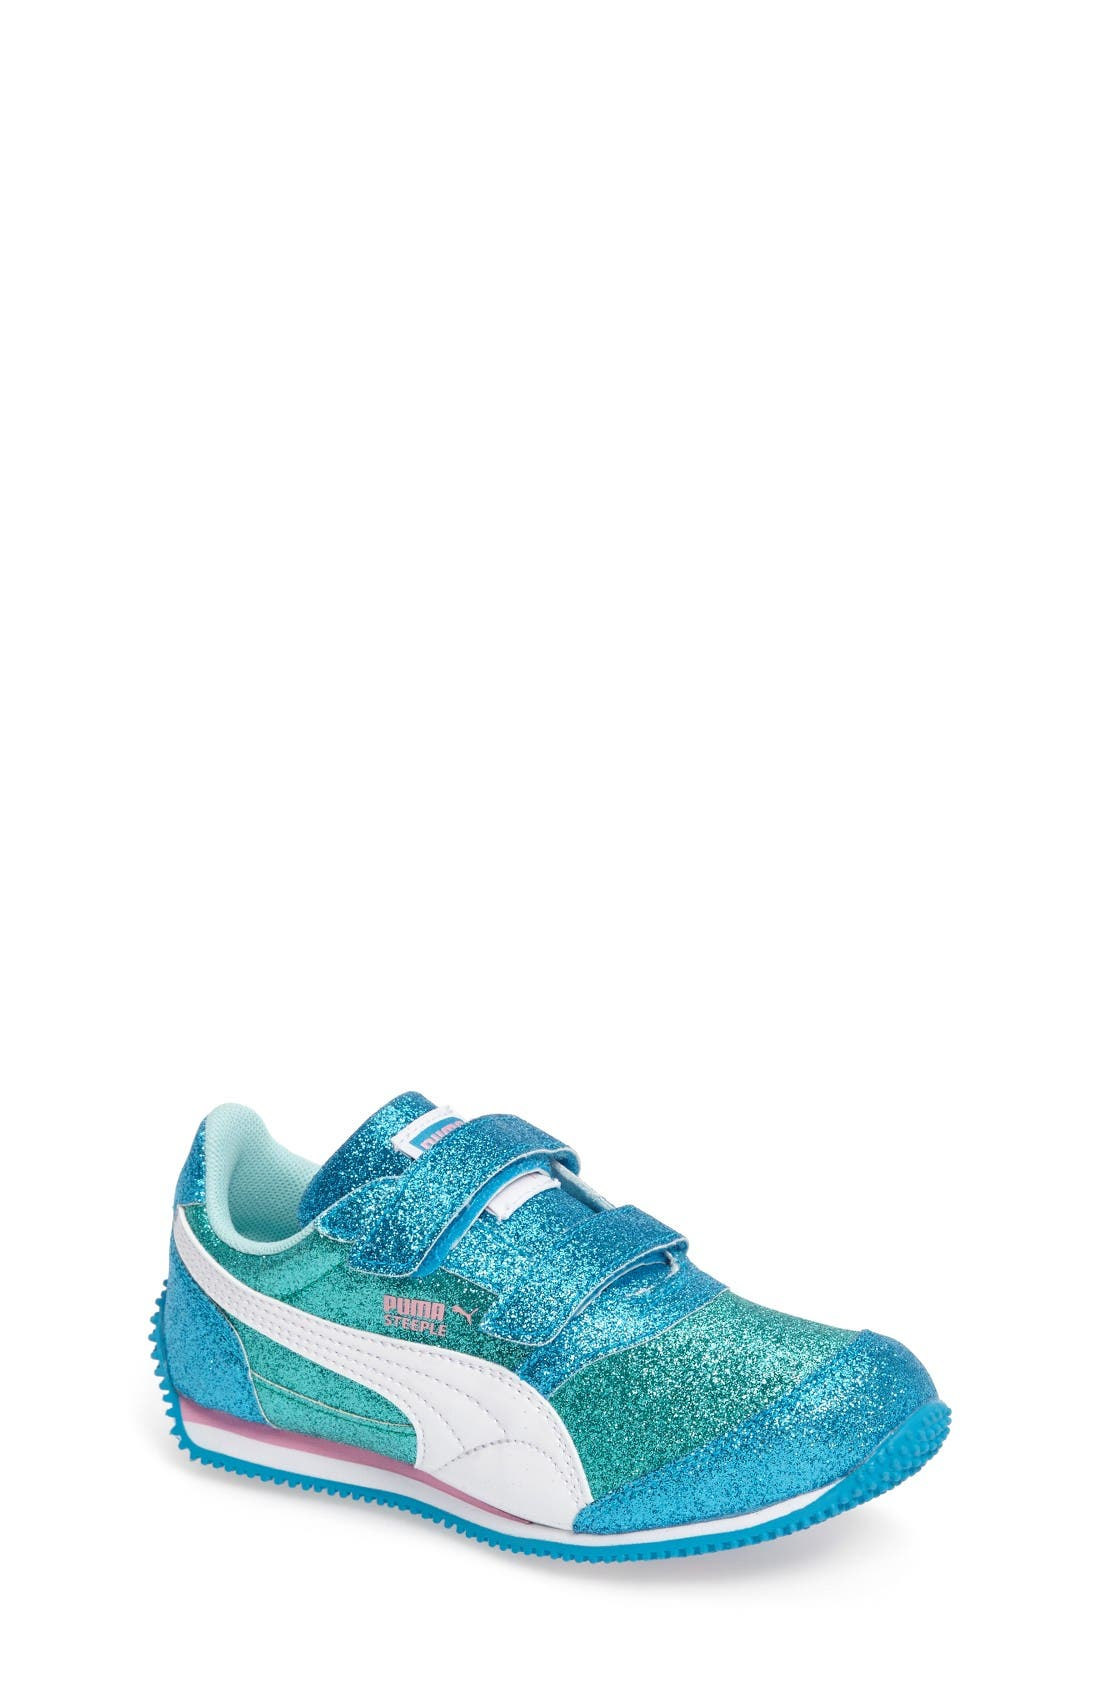 Alternate Image 1 Selected - PUMA Steeple Glitz Glam Sneaker (Baby, Walker, Toddler, Little Kid & Big Kid)